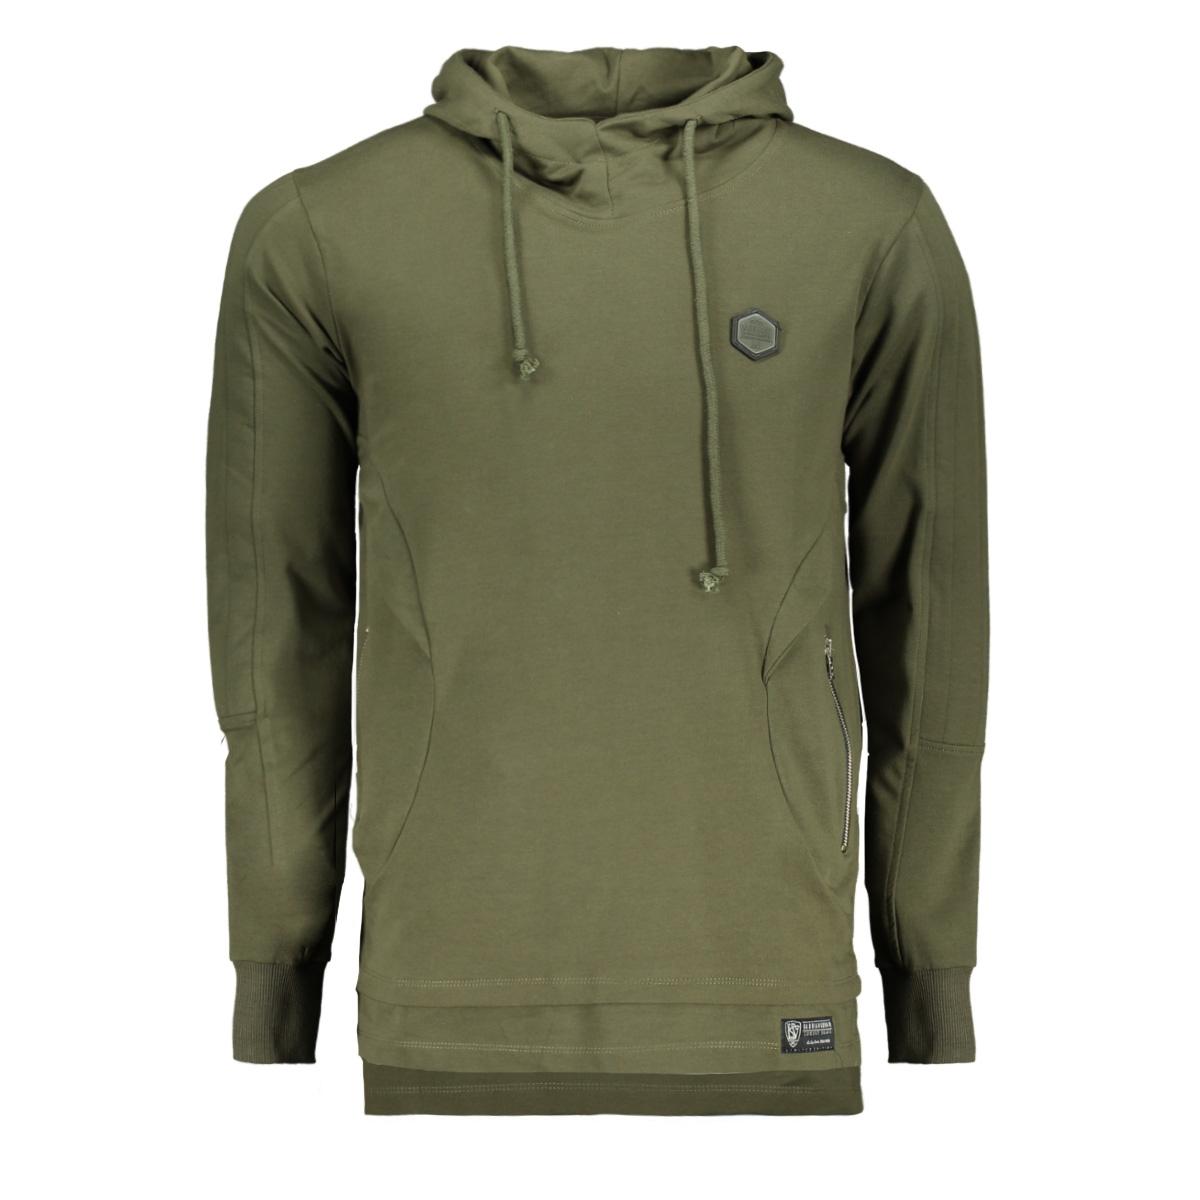 76124 gabbiano sweater army